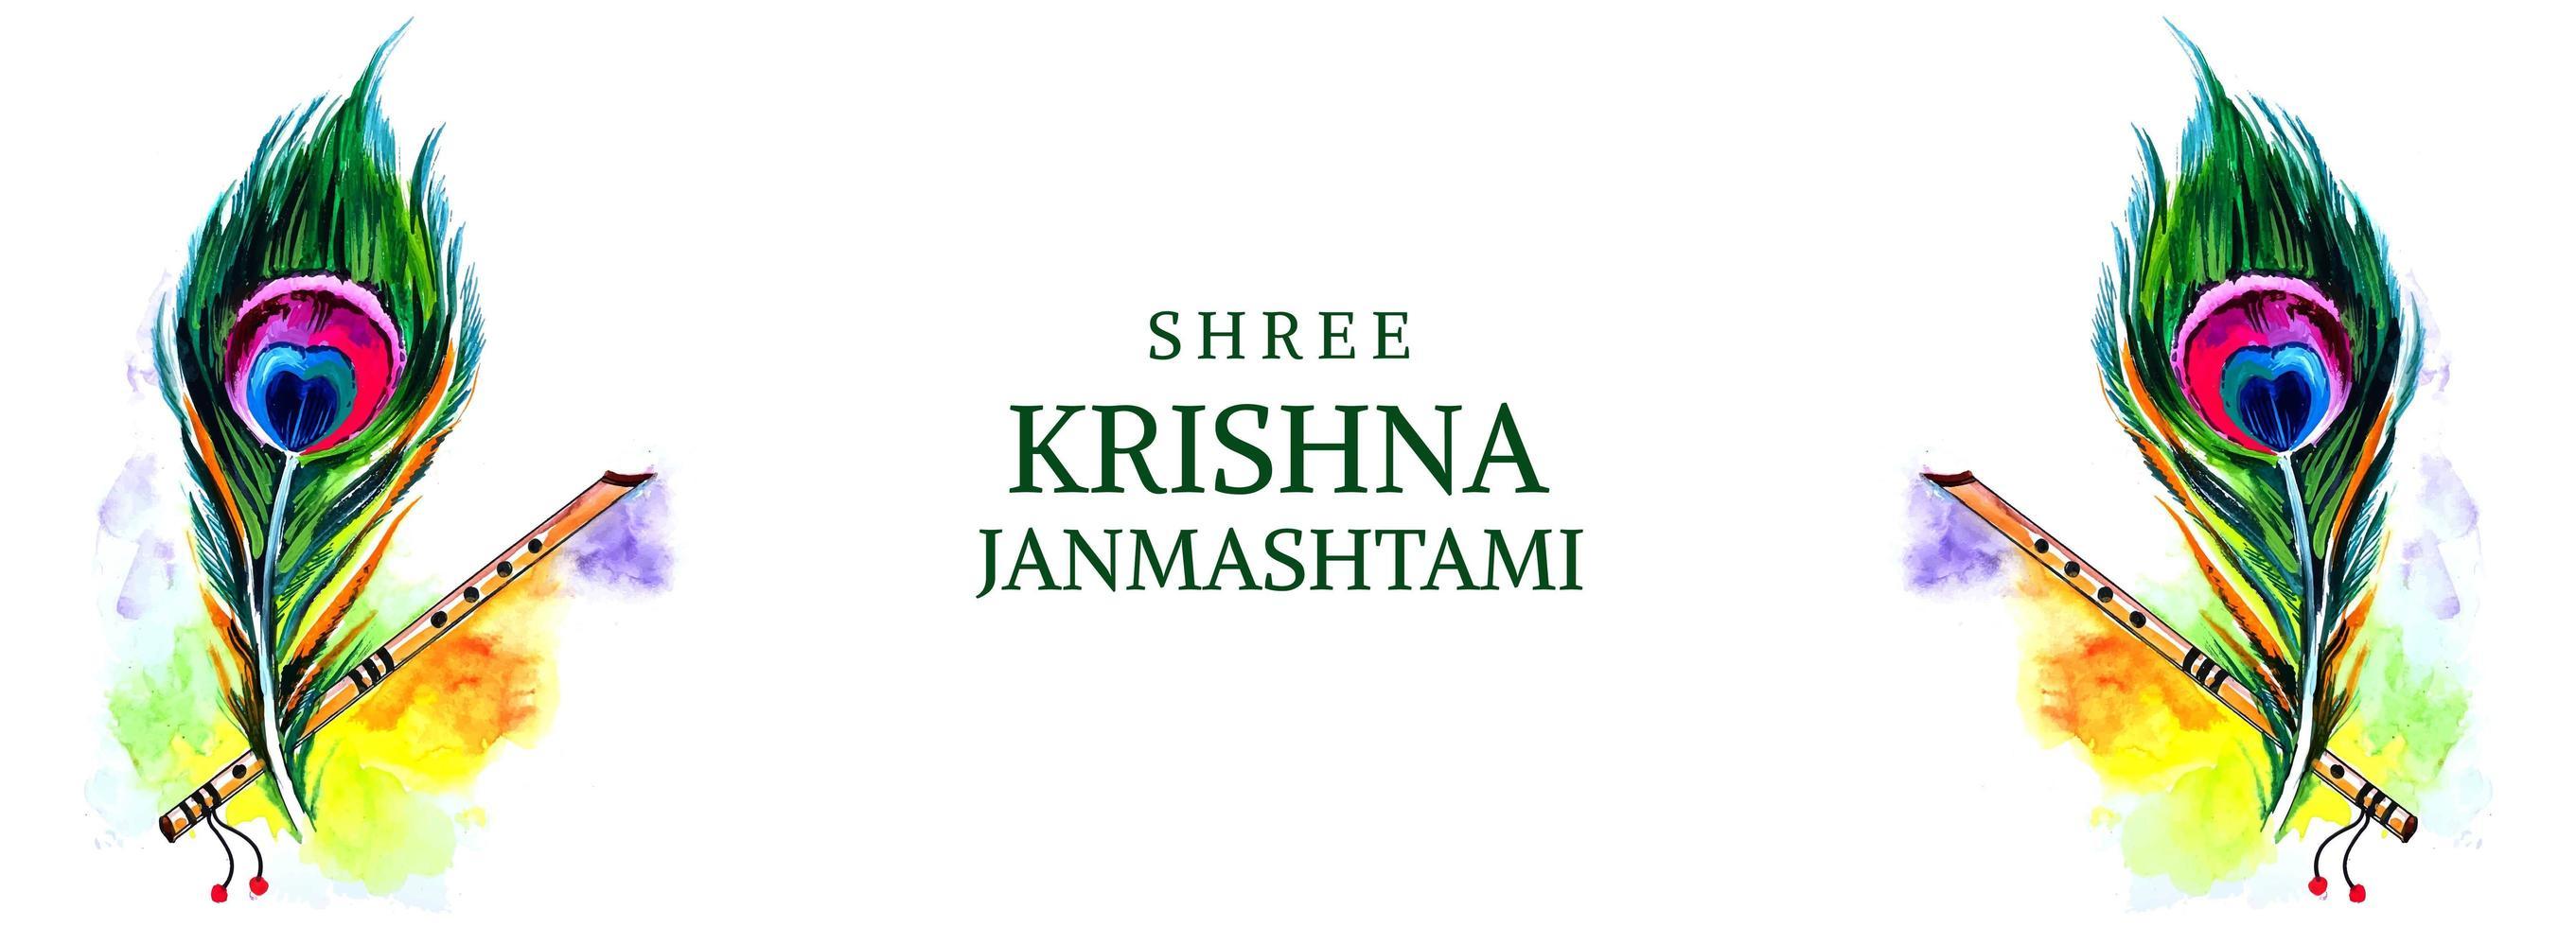 shree krishna janmashtami banner kort vektor